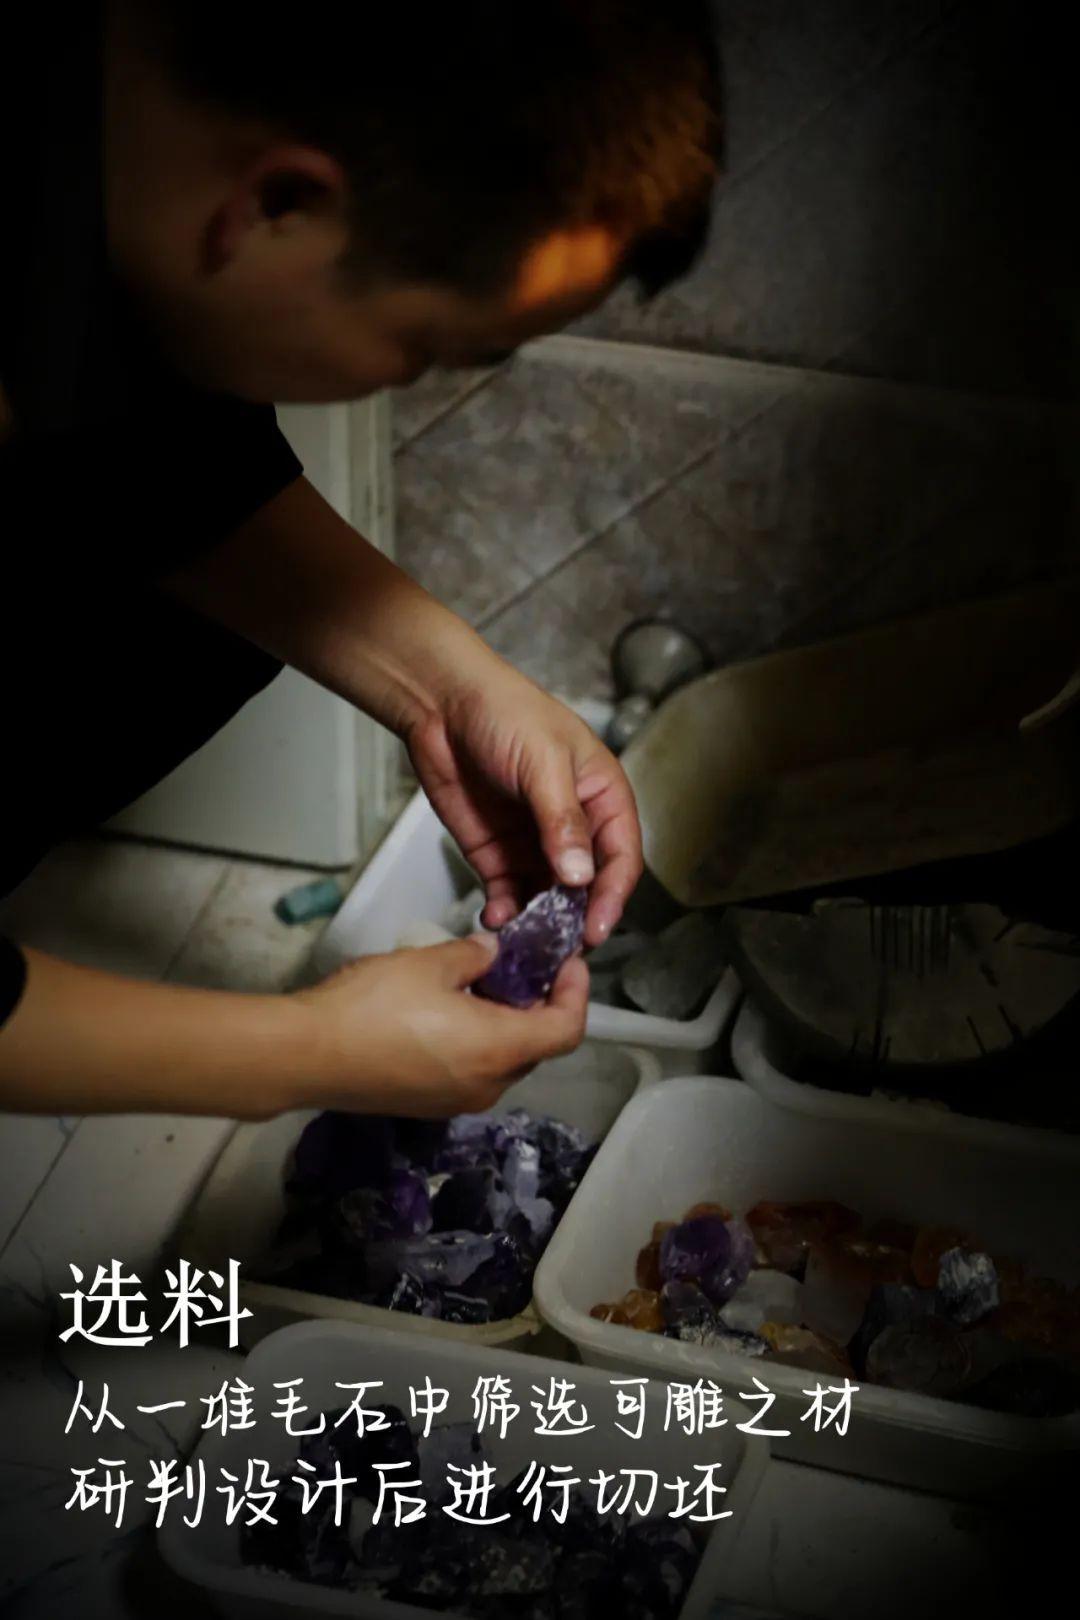 resize,m fill,h 1620,w 1080 - 一块块的水晶原石是怎么变成精美的水晶艺术品的?